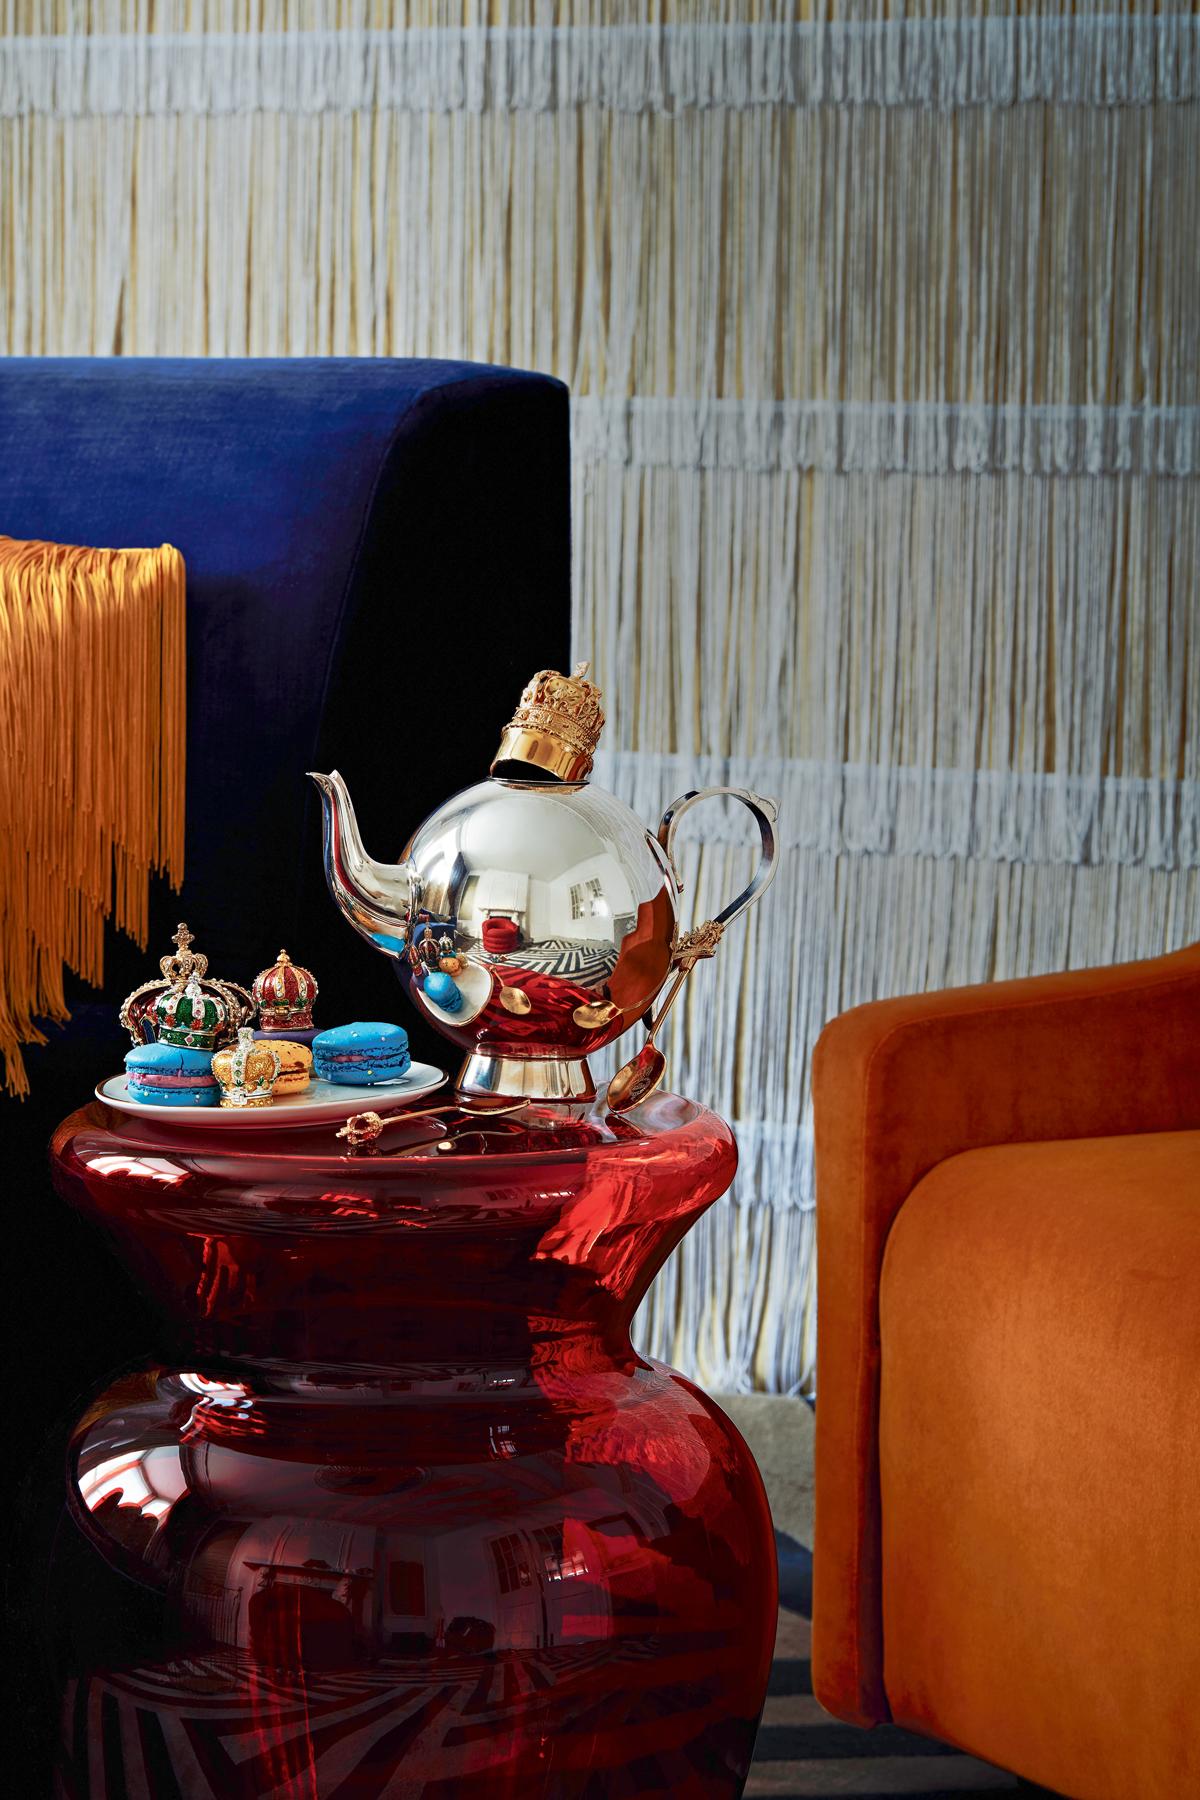 delta sofa debenhams western sofas sectionals decorating trend regimental dress livingetc furniture for details see opposite first poltrona armchair in ochre velvet 2 529 gallotti radice at harrods la boheme 3 stool 128